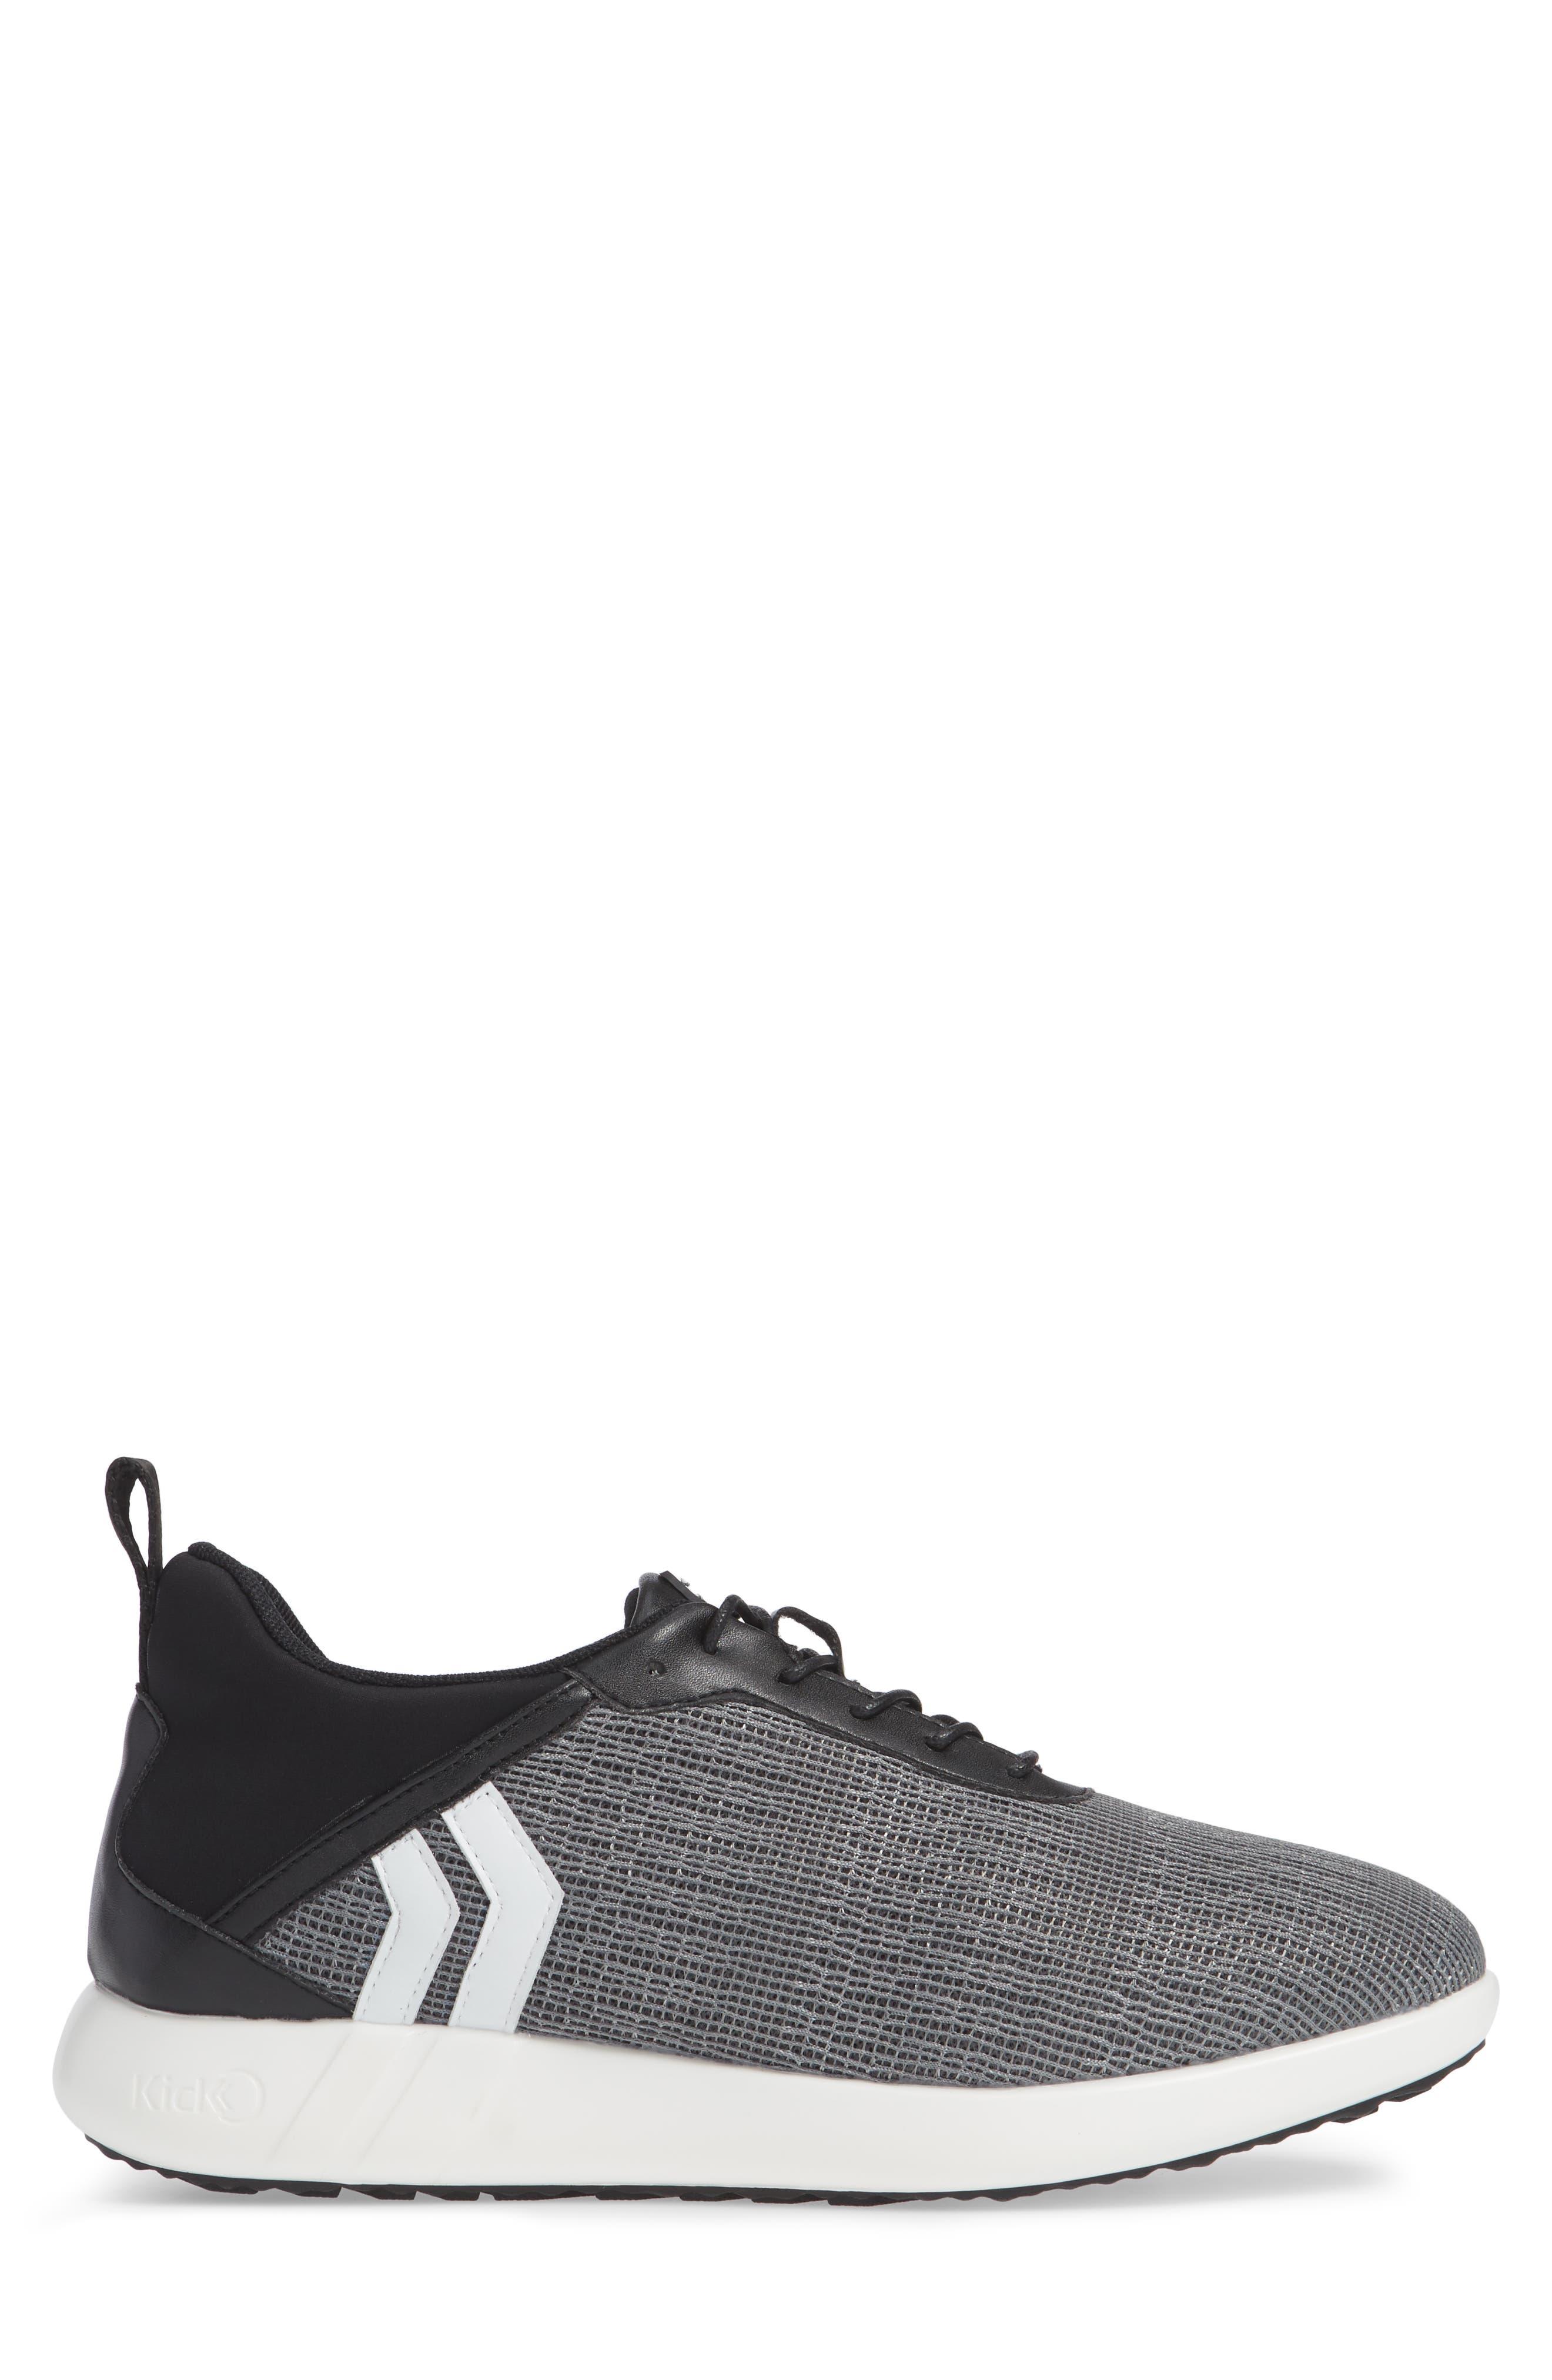 Foam Sneaker,                             Alternate thumbnail 3, color,                             021